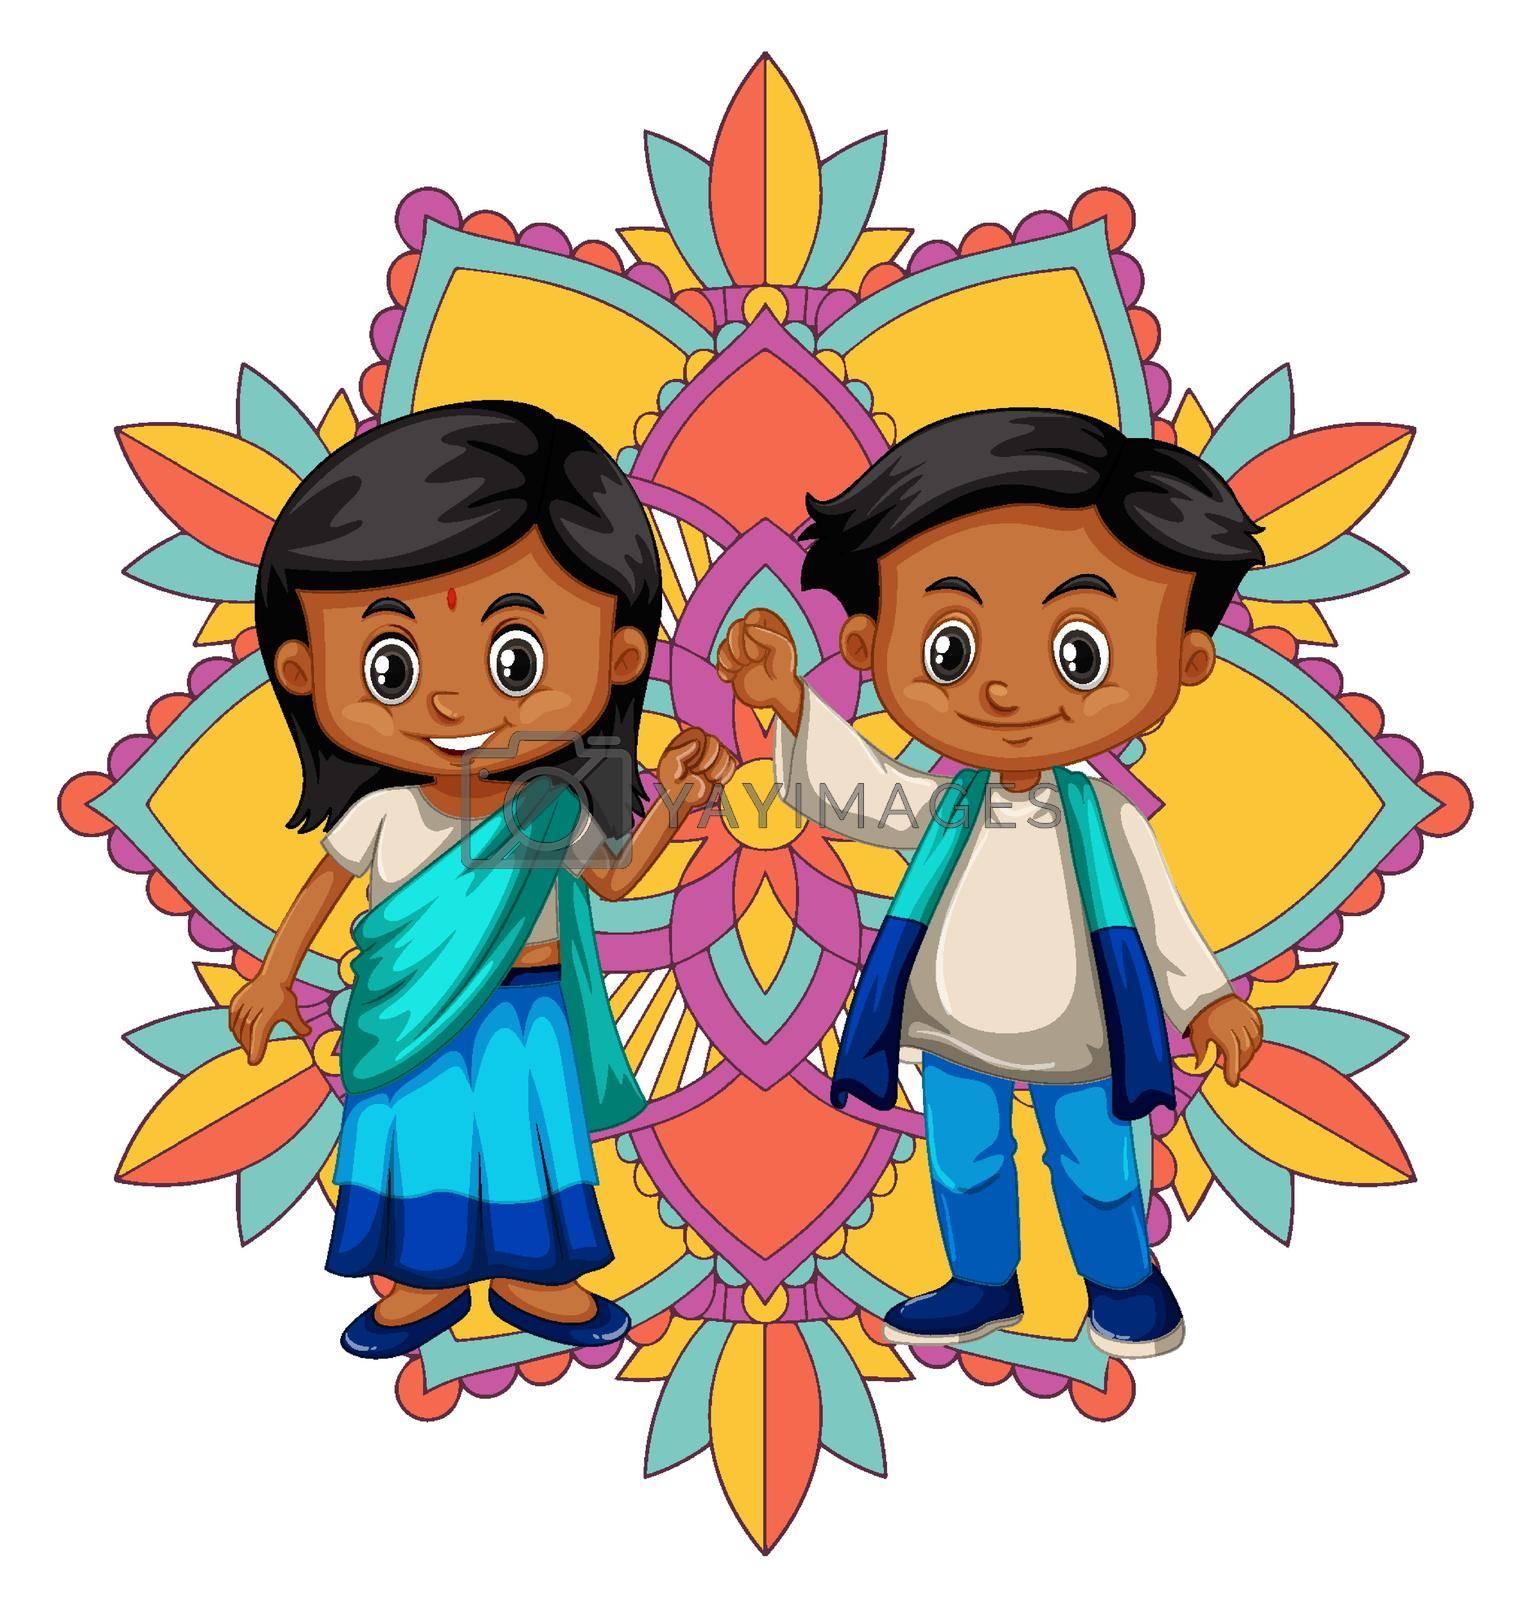 Mandala pattern design background with two happy kids illustration